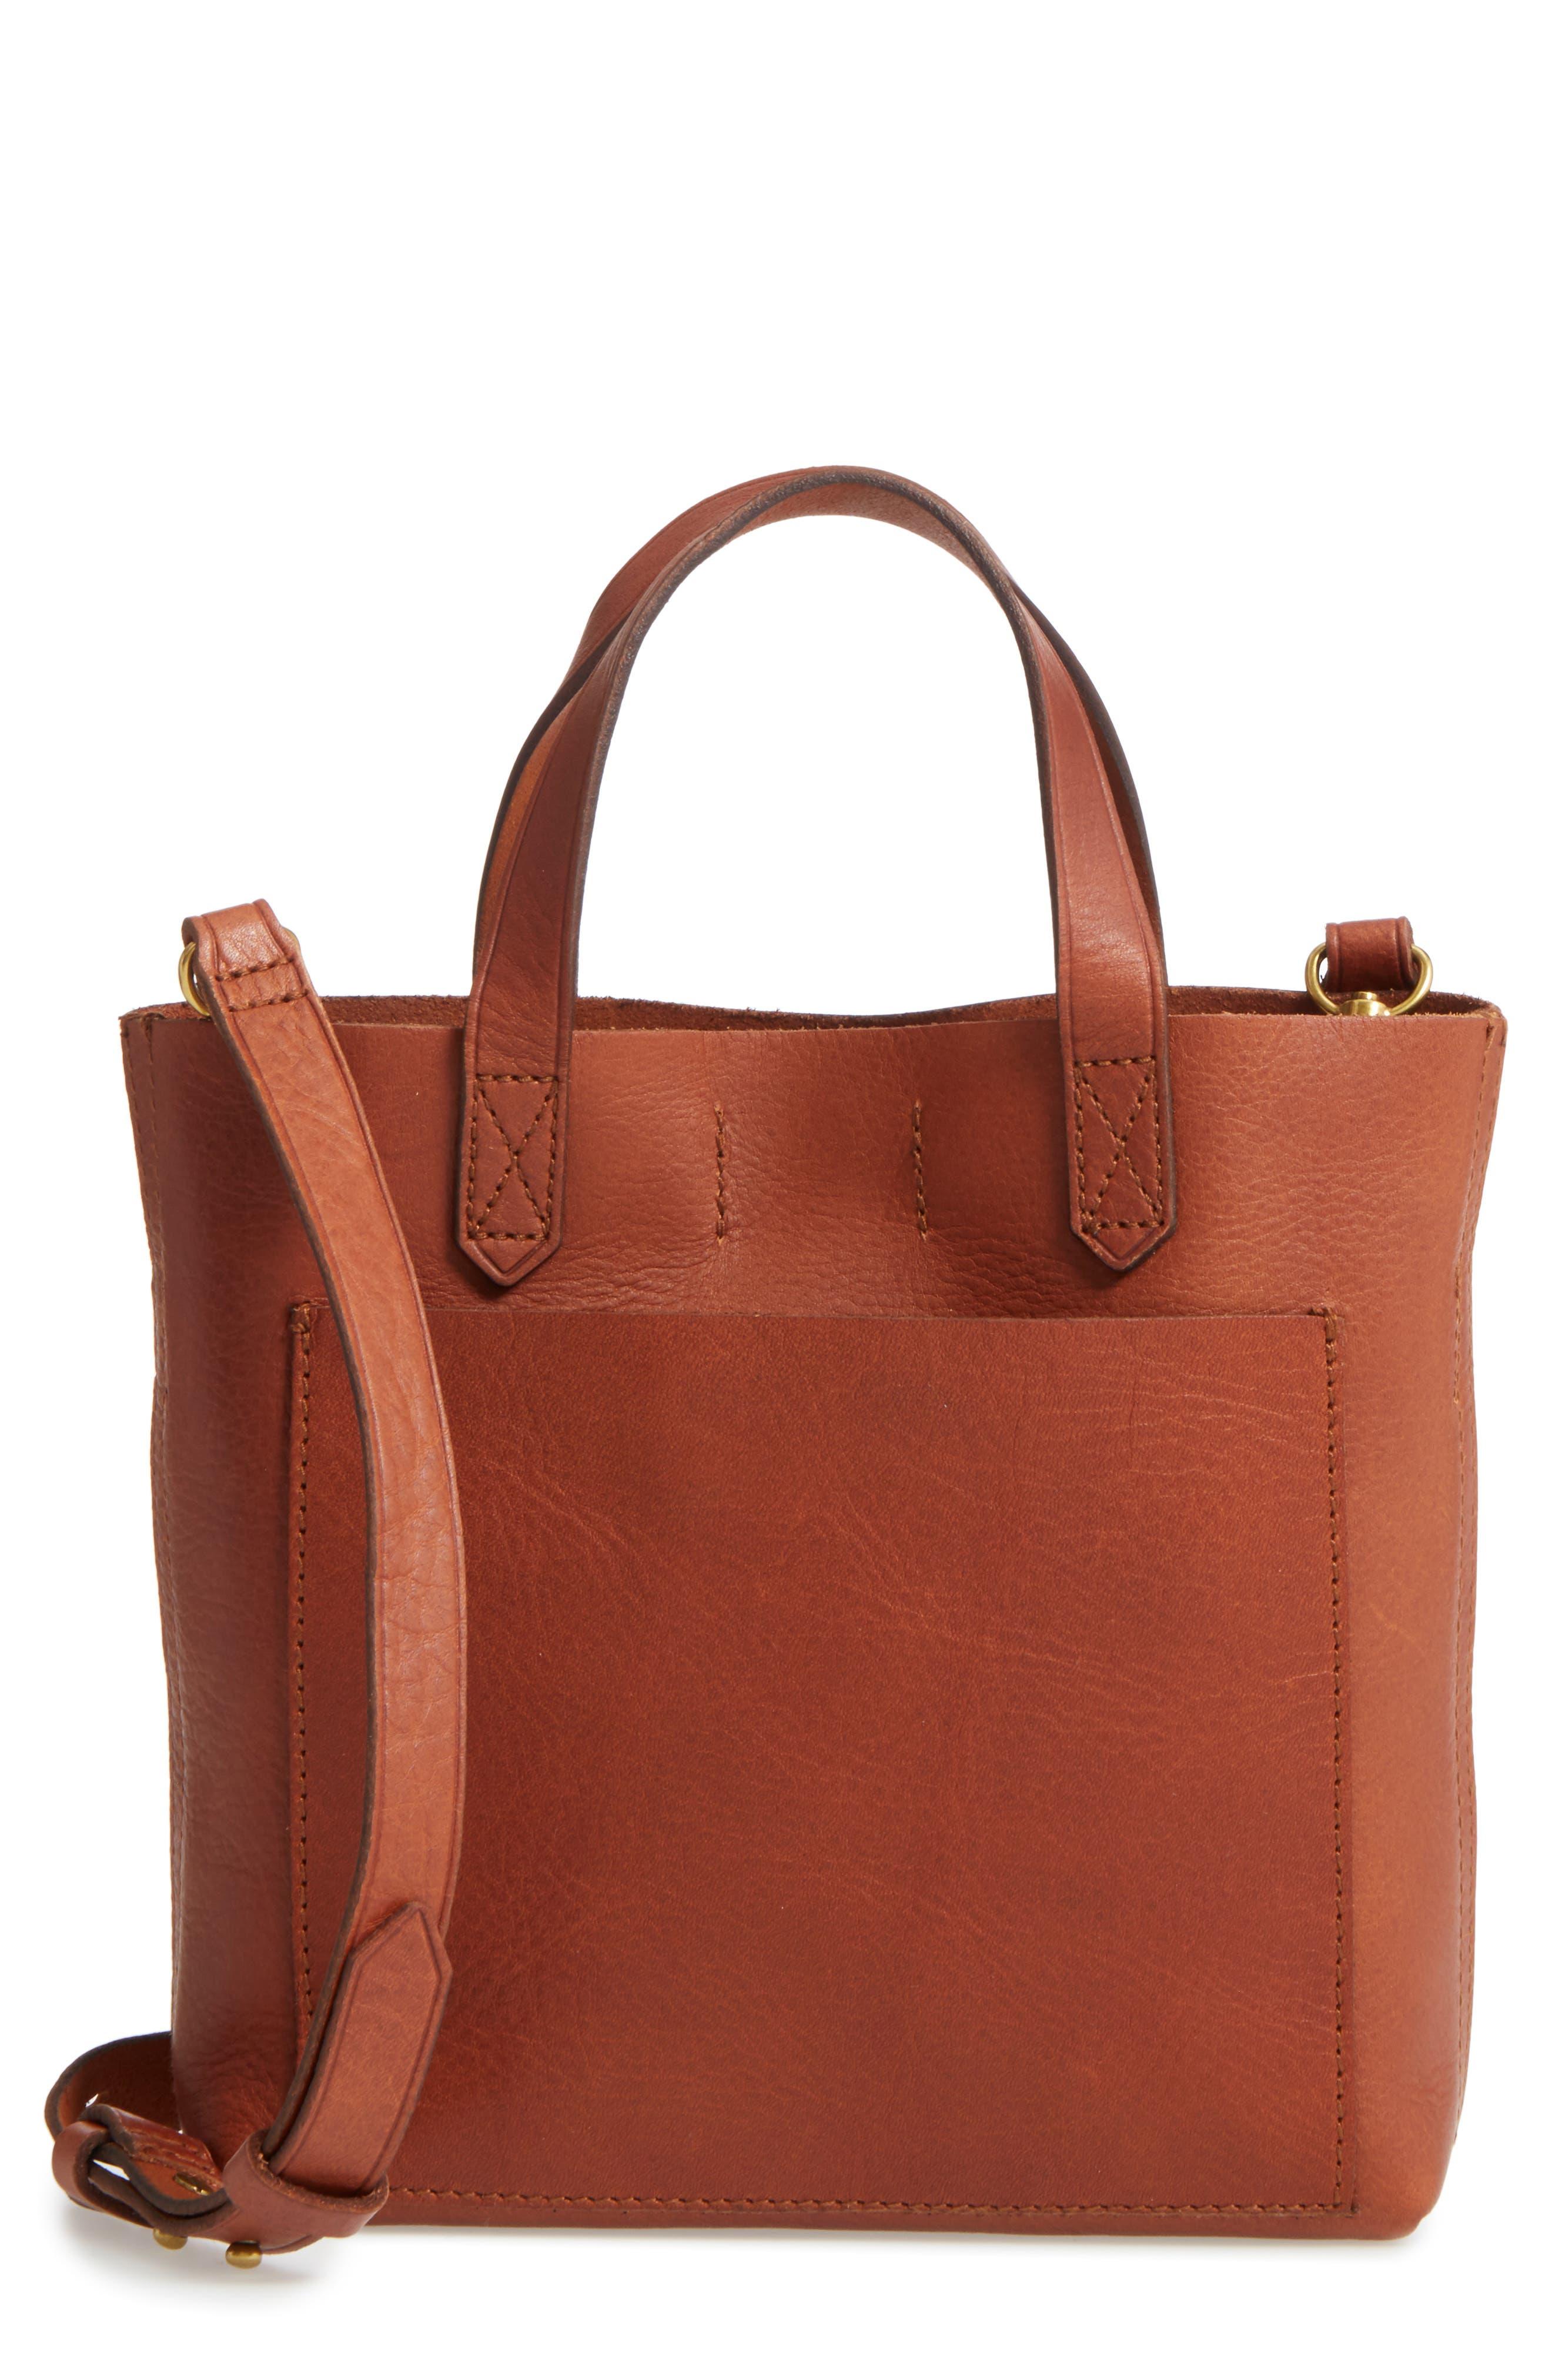 Madewell Small Transport Leather Crossbody Bag